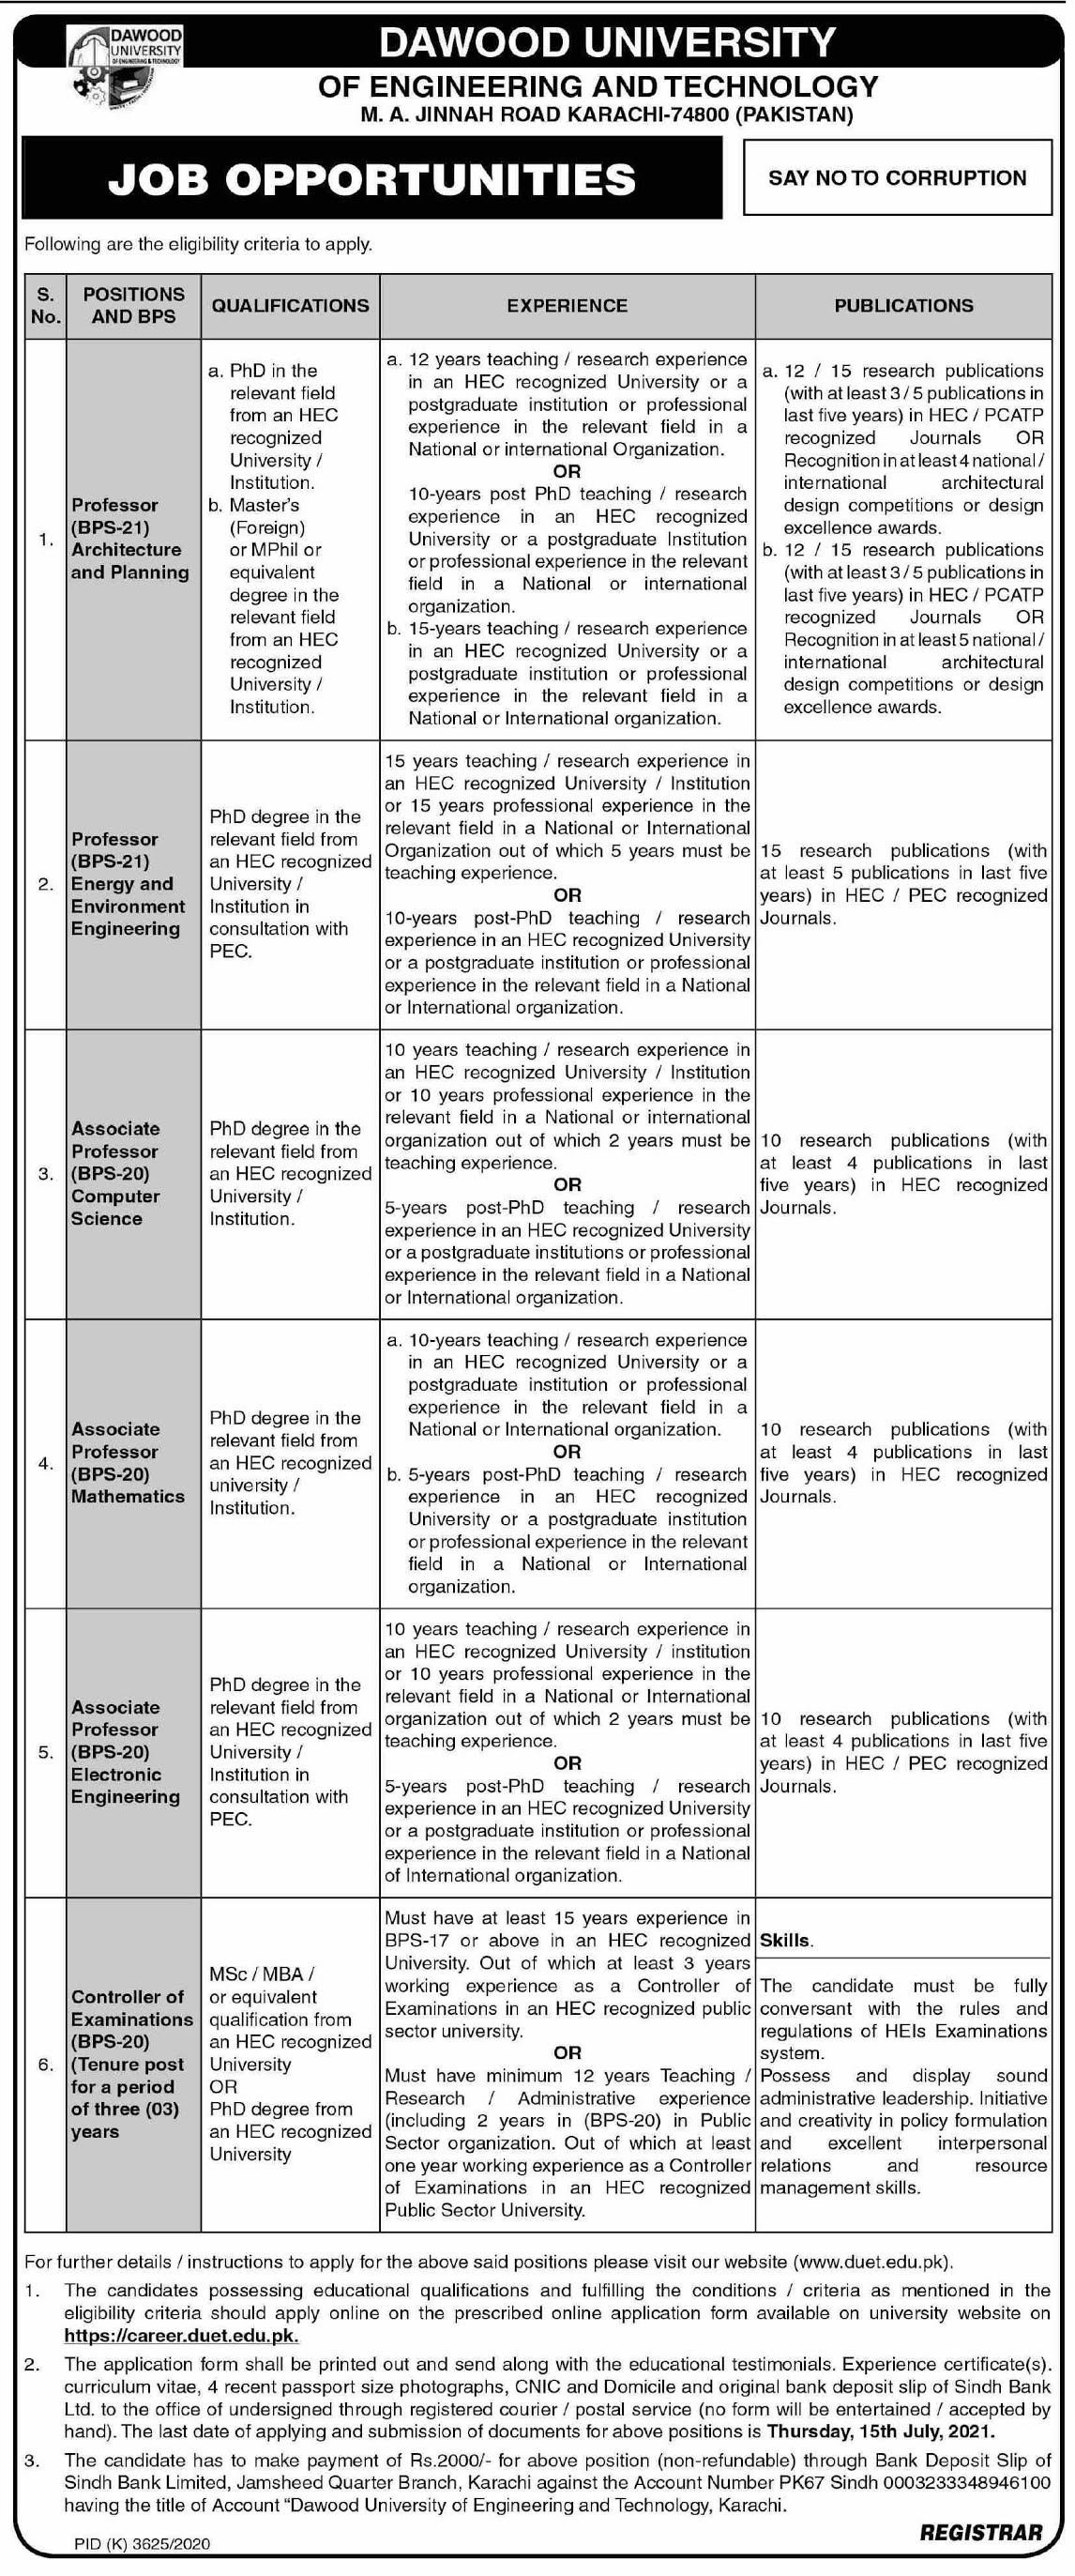 https://career.duet.edu.pk - Dawood University Of Engineering And Technology Jobs 2021 in Pakistan